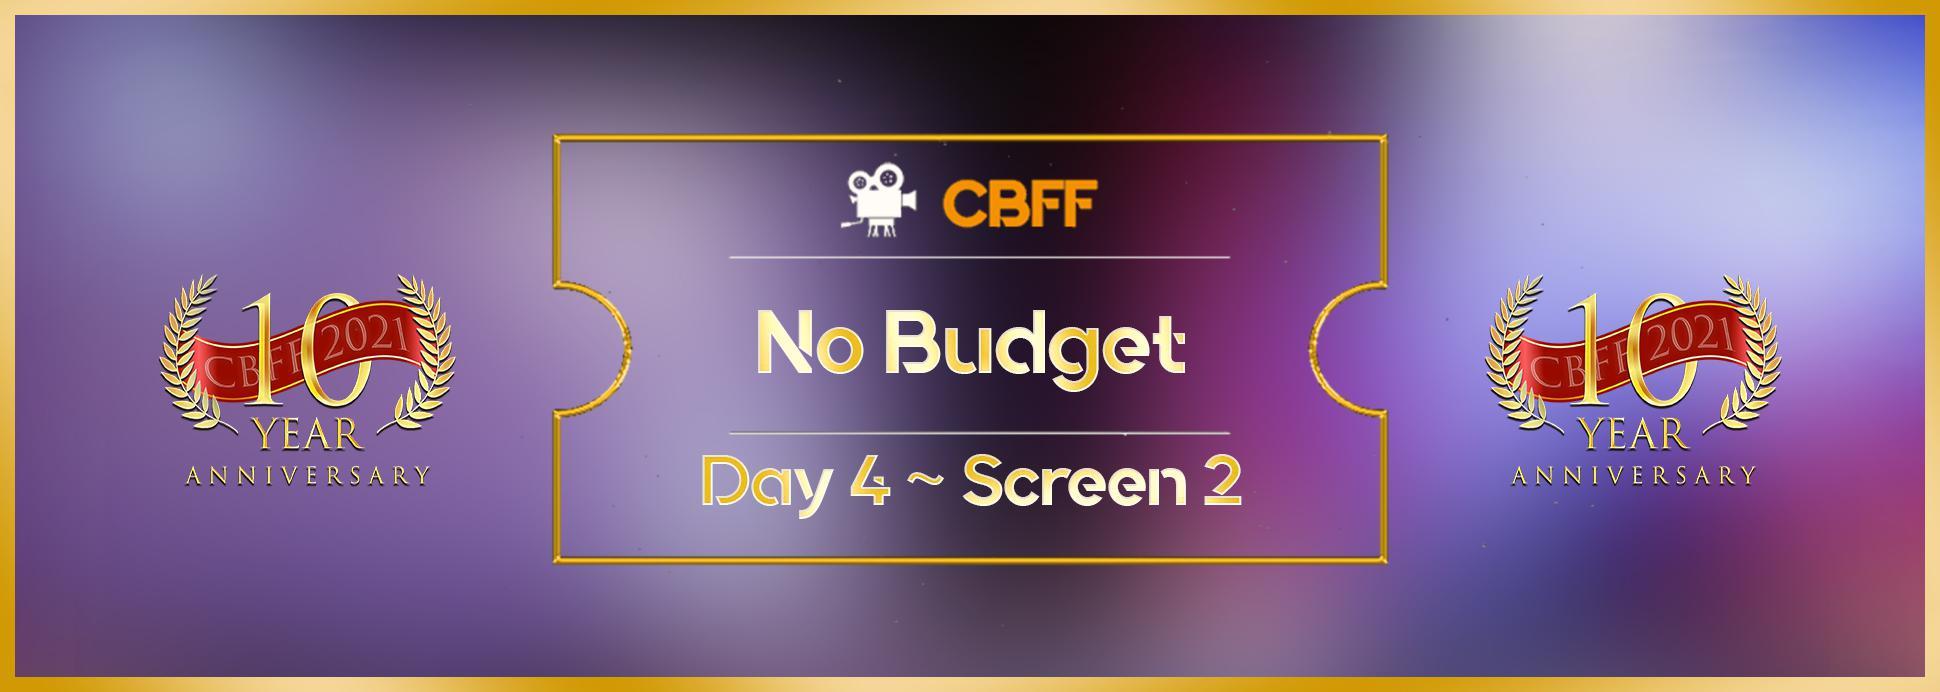 Day 4, Screen 2: No Budget 3